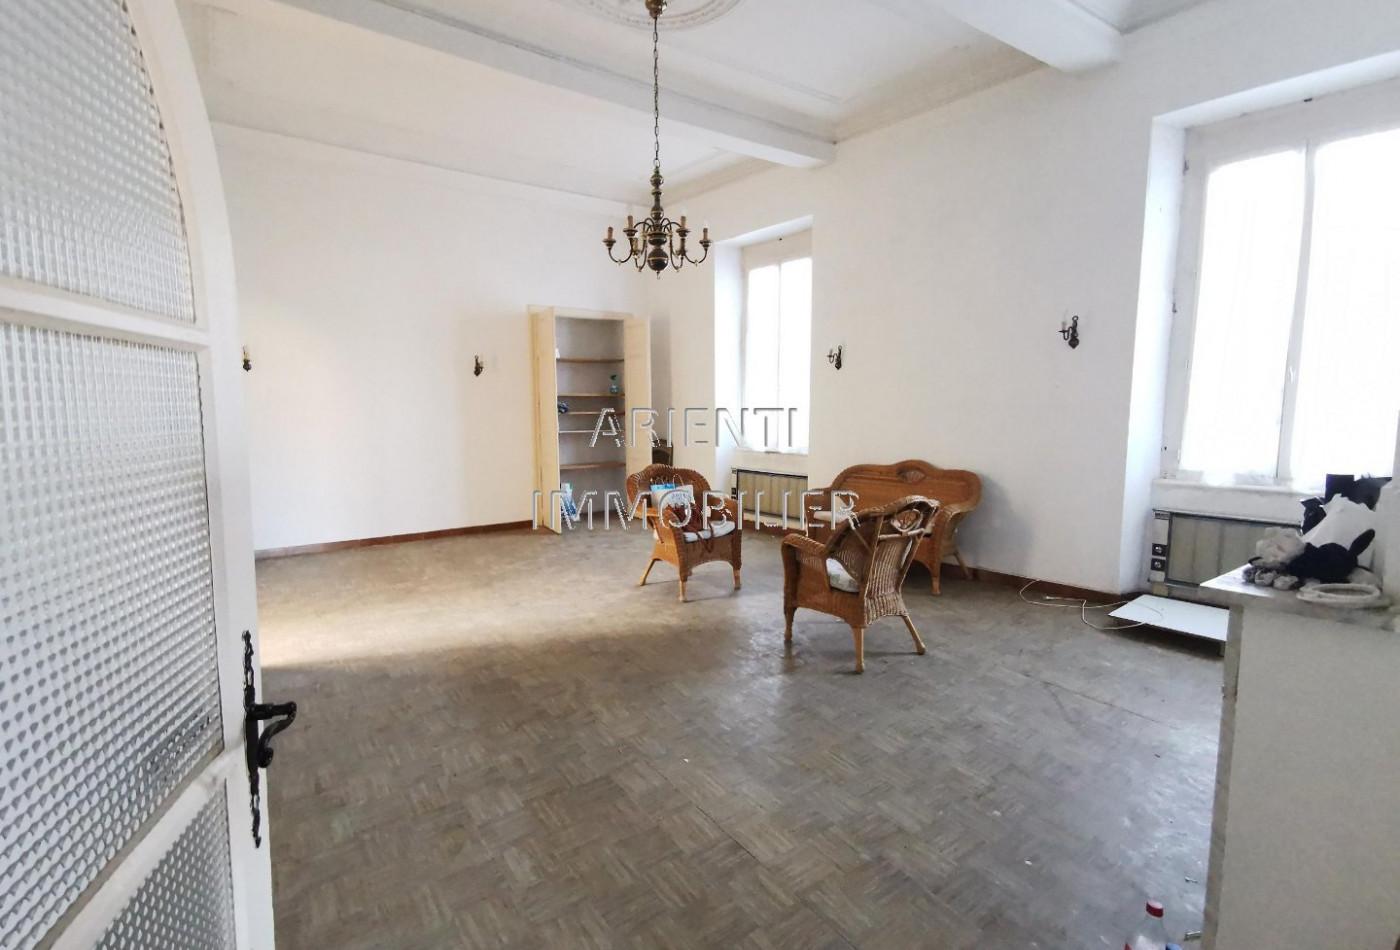 A vendre  Valreas   Réf 260013107 - Office immobilier arienti